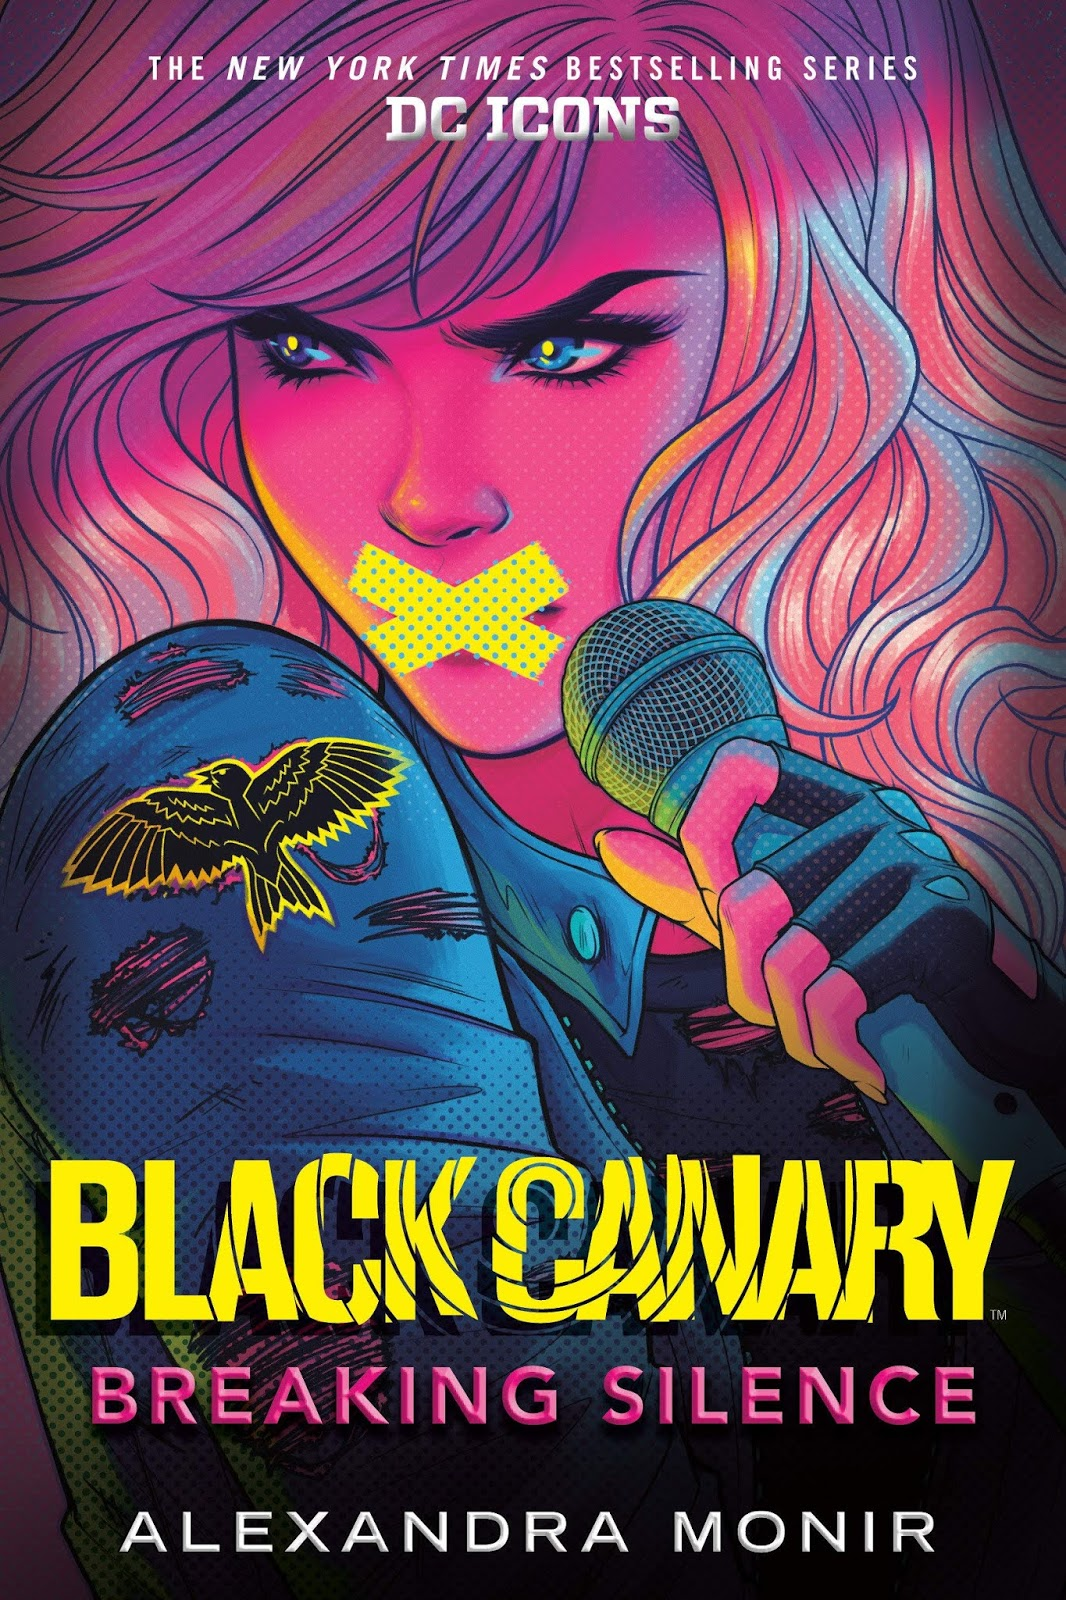 Black Canary: Breaking Silence by Alexandra Monir